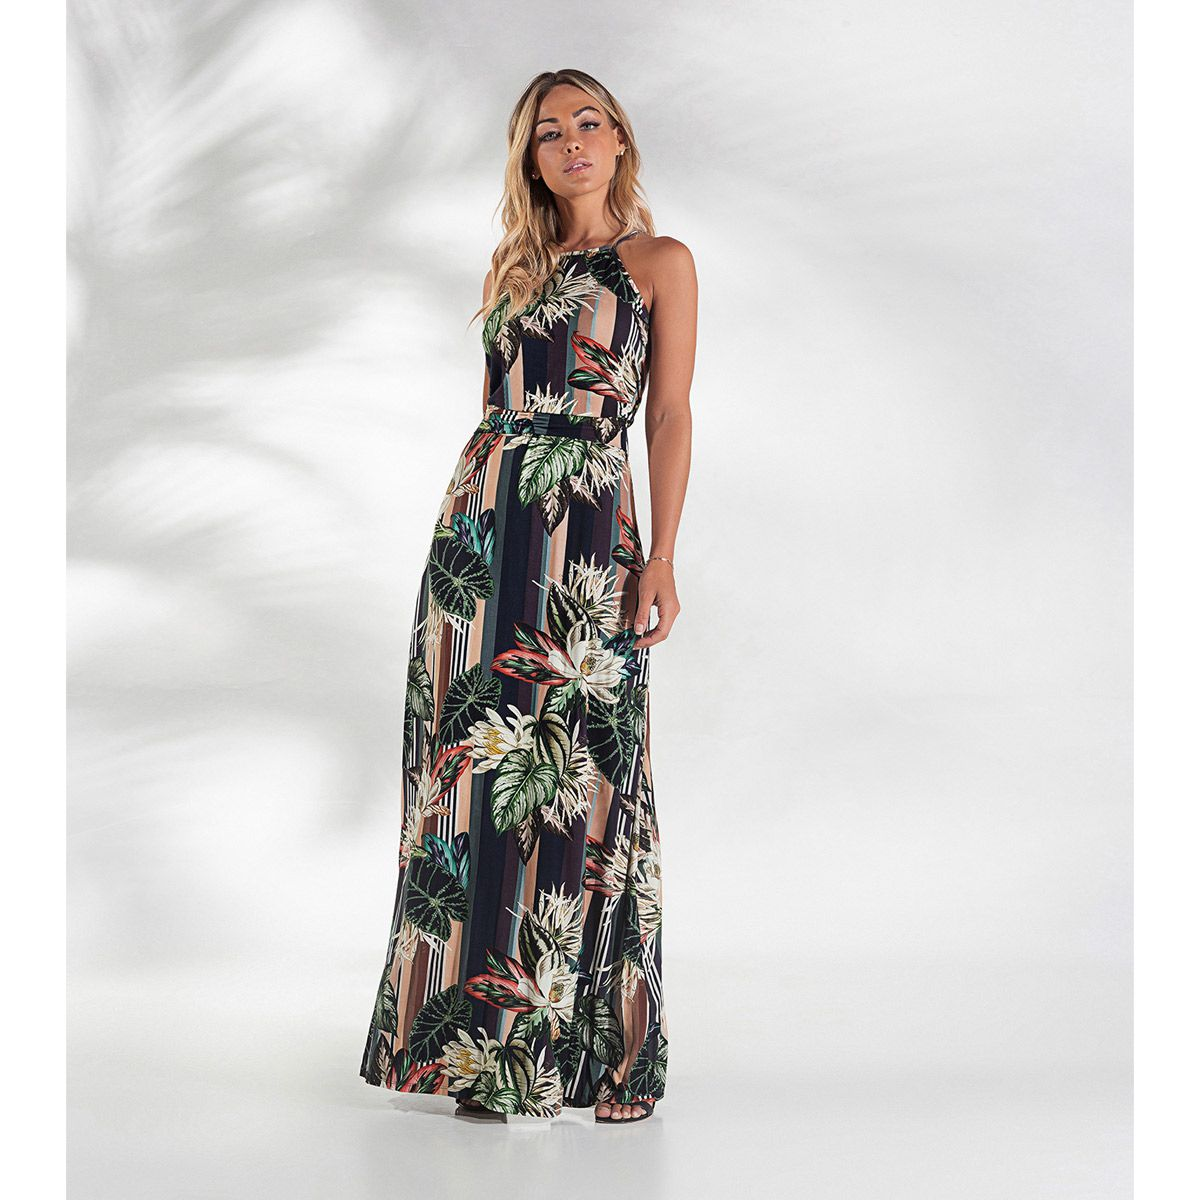 Vestido Feminino Longo Endless E13373